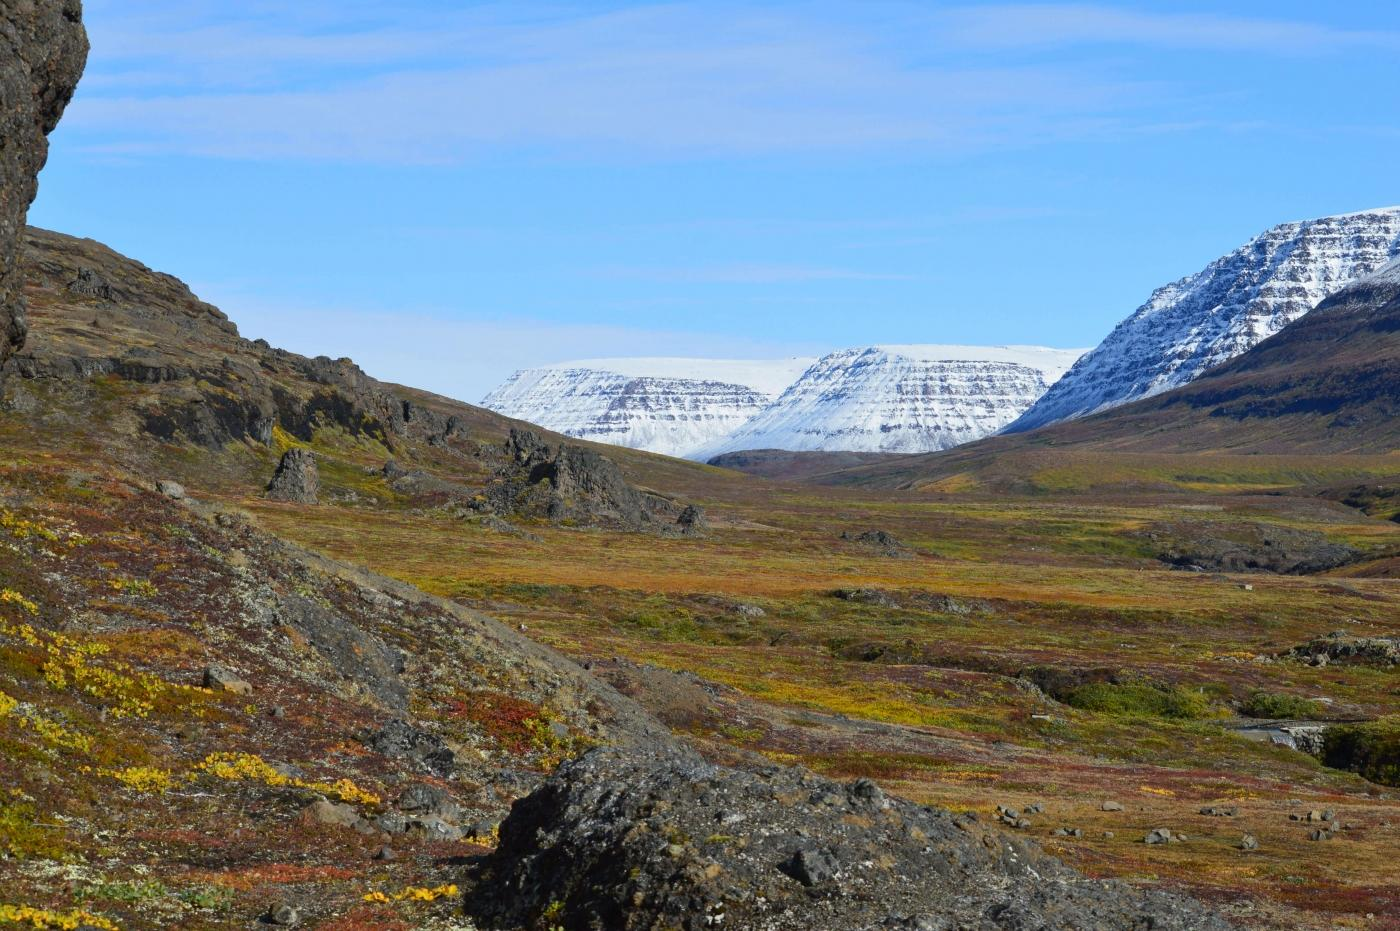 Beautiful, serene landscape near Qeqertarsuaq. Photo by Skansen - Your Home, Visit Greenland